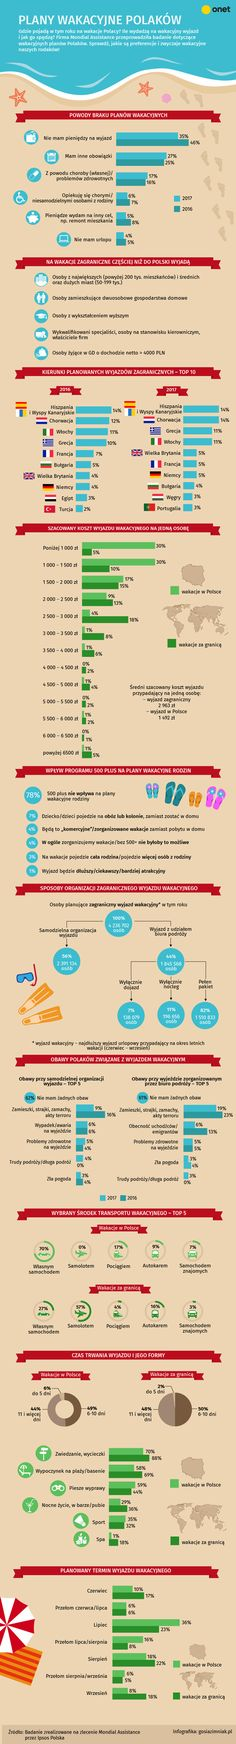 #infografika #wakacje